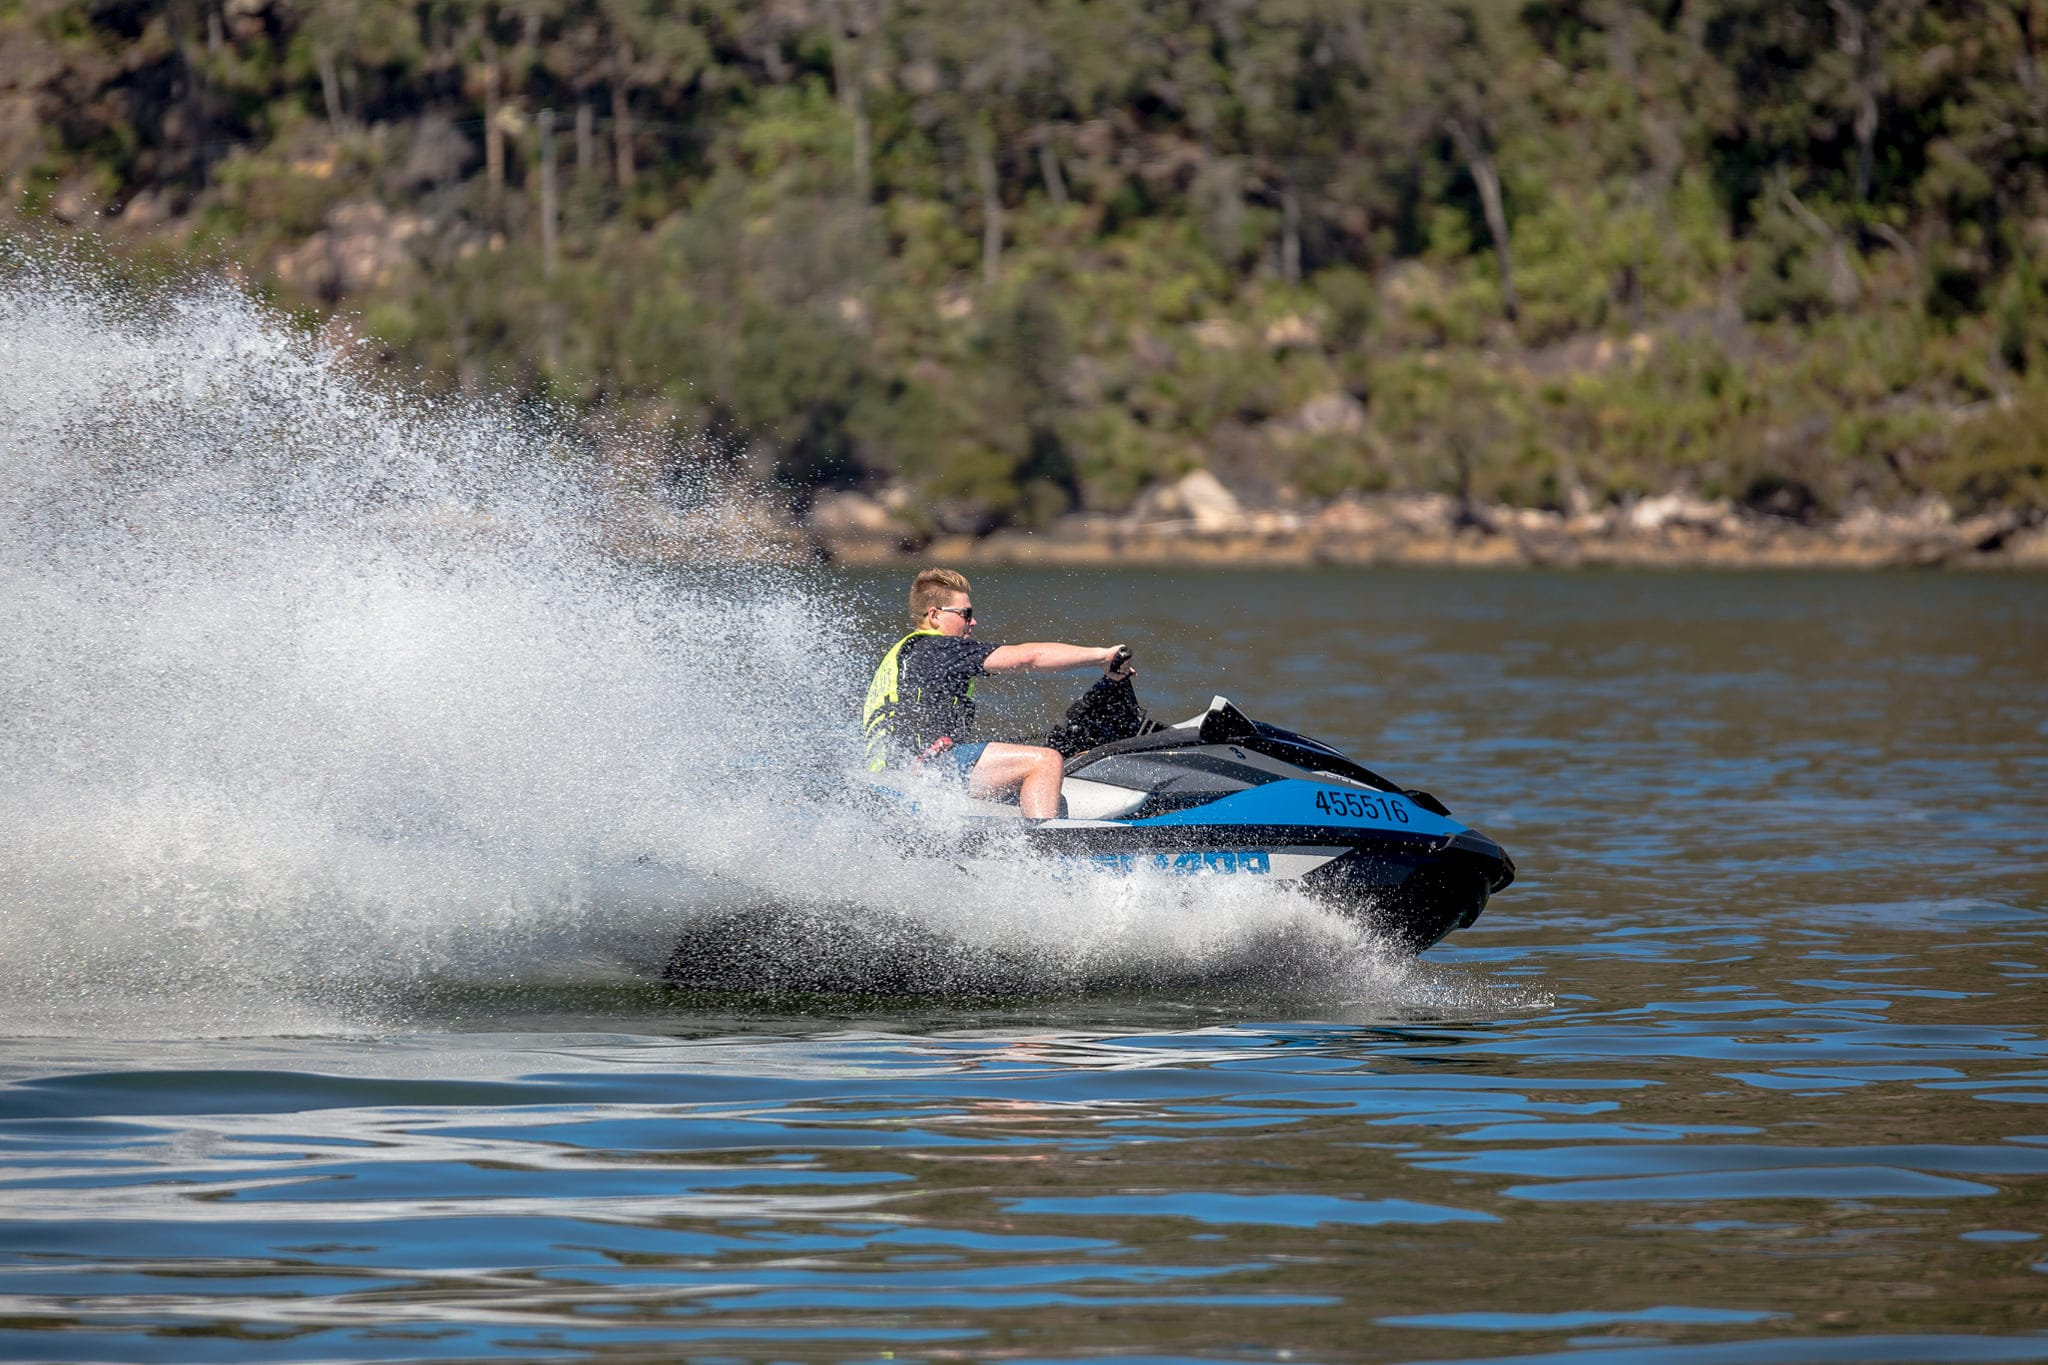 Jet Ski Tour, 2.5 Hours - Hawkesbury River - Seats 2 People